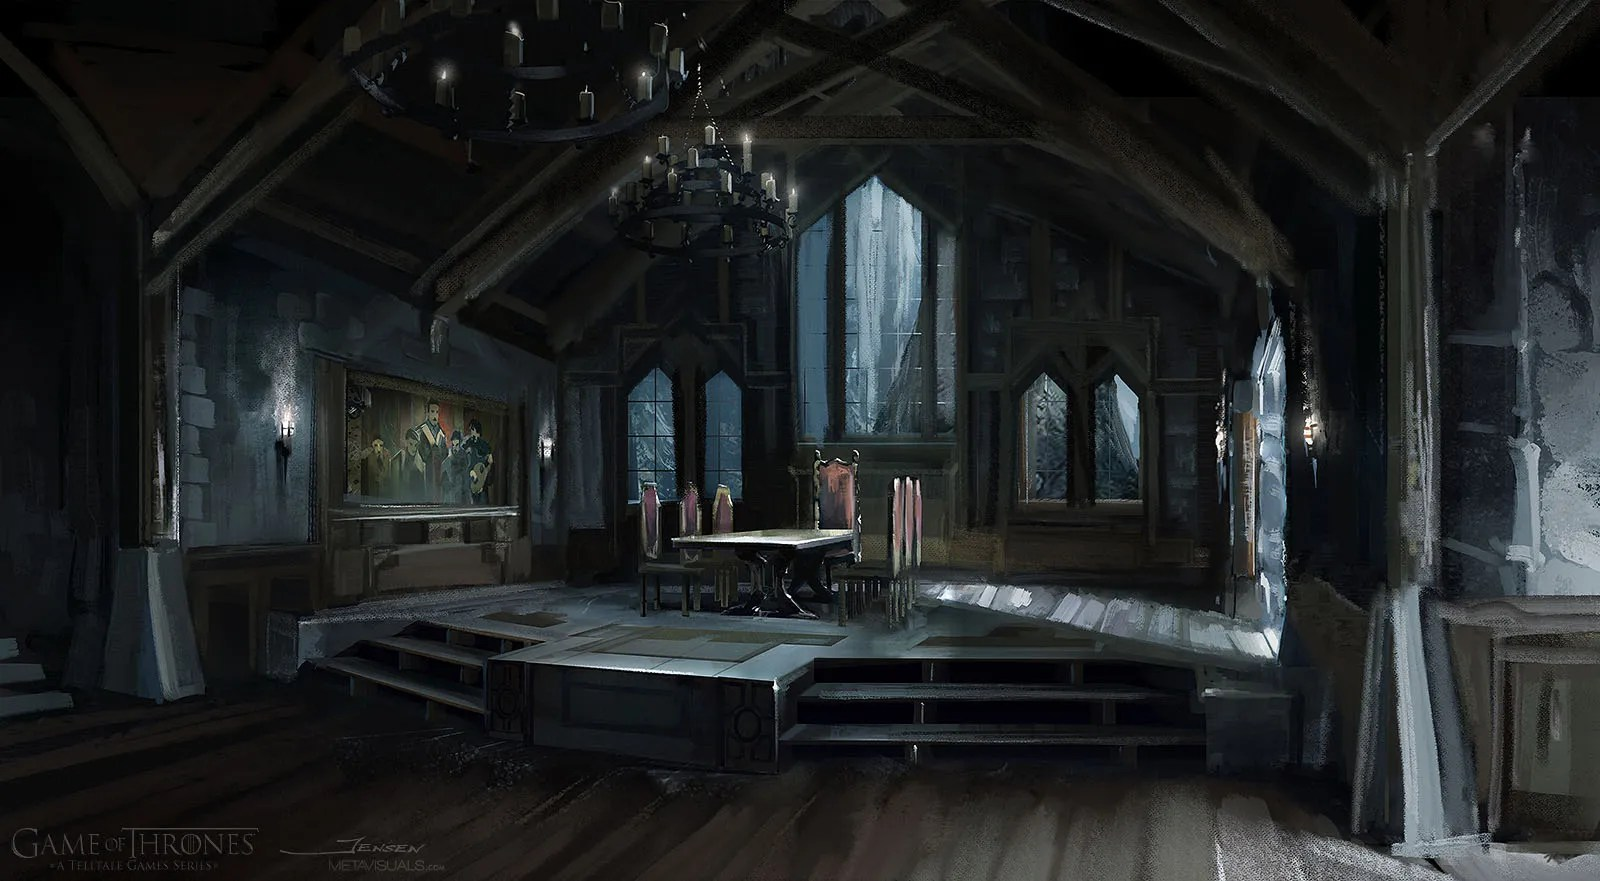 Patrick Jensen - Game of Thrones, Great Hall